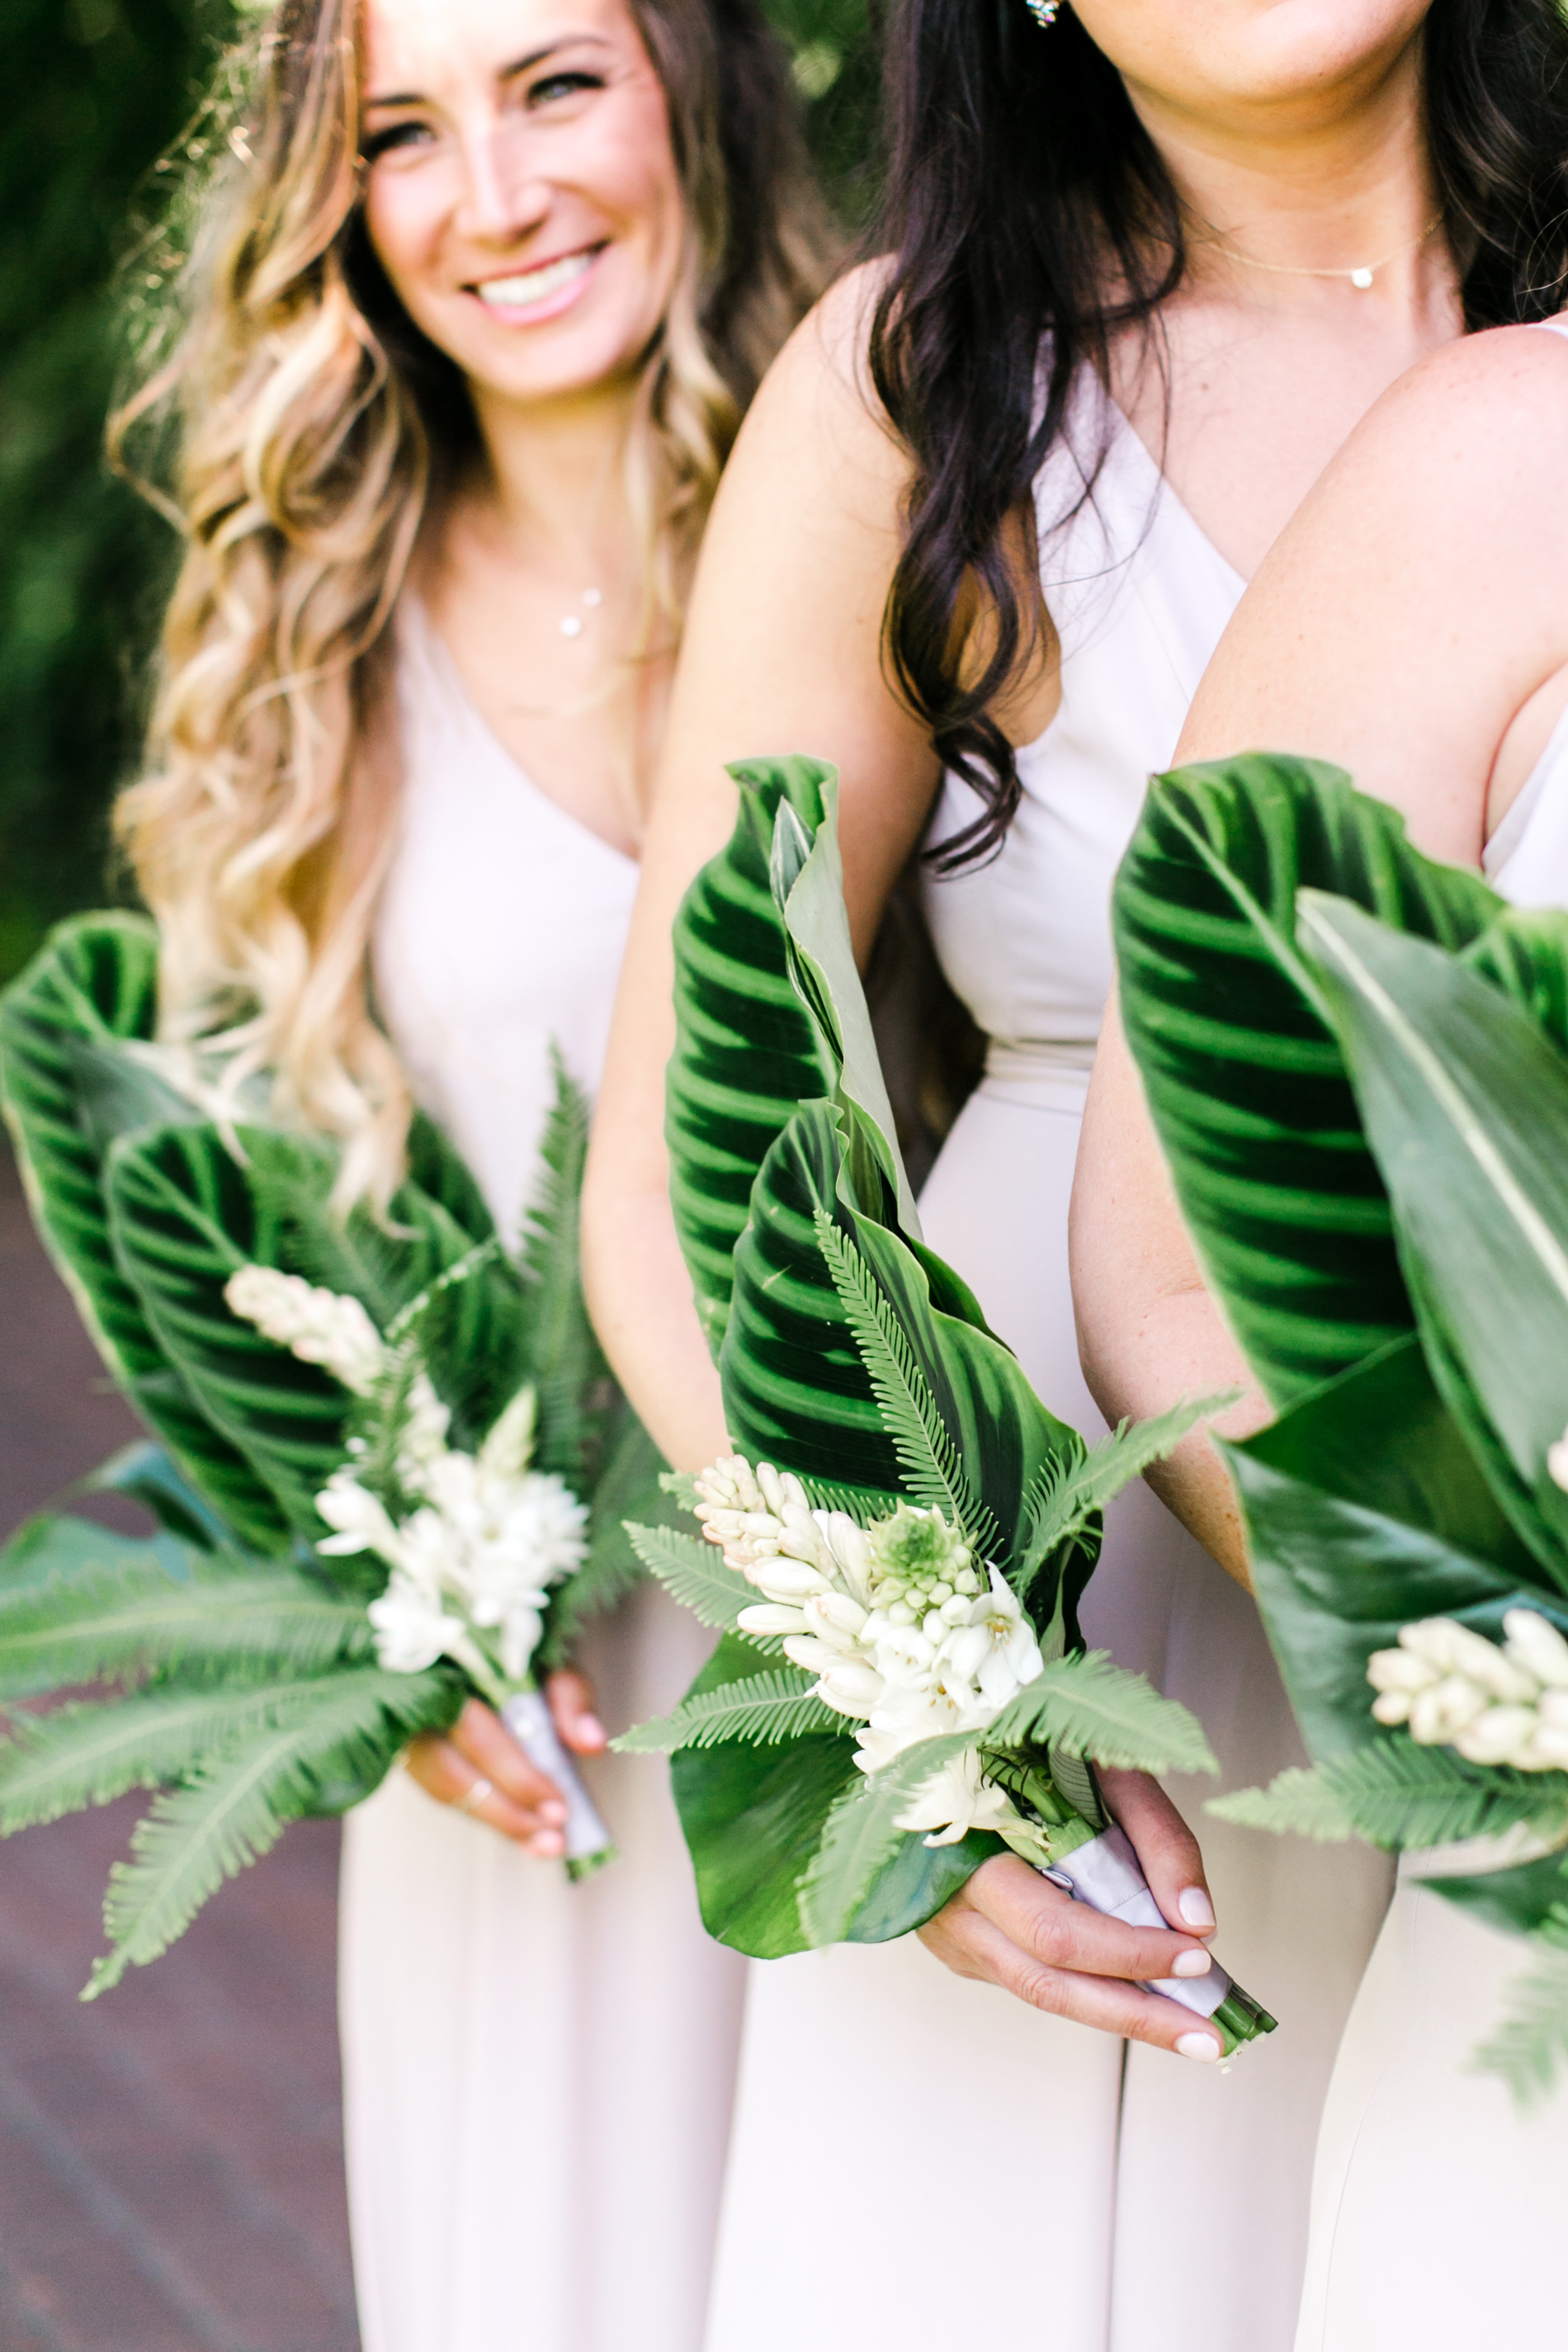 tropical leaf Framed White Florals bouquet